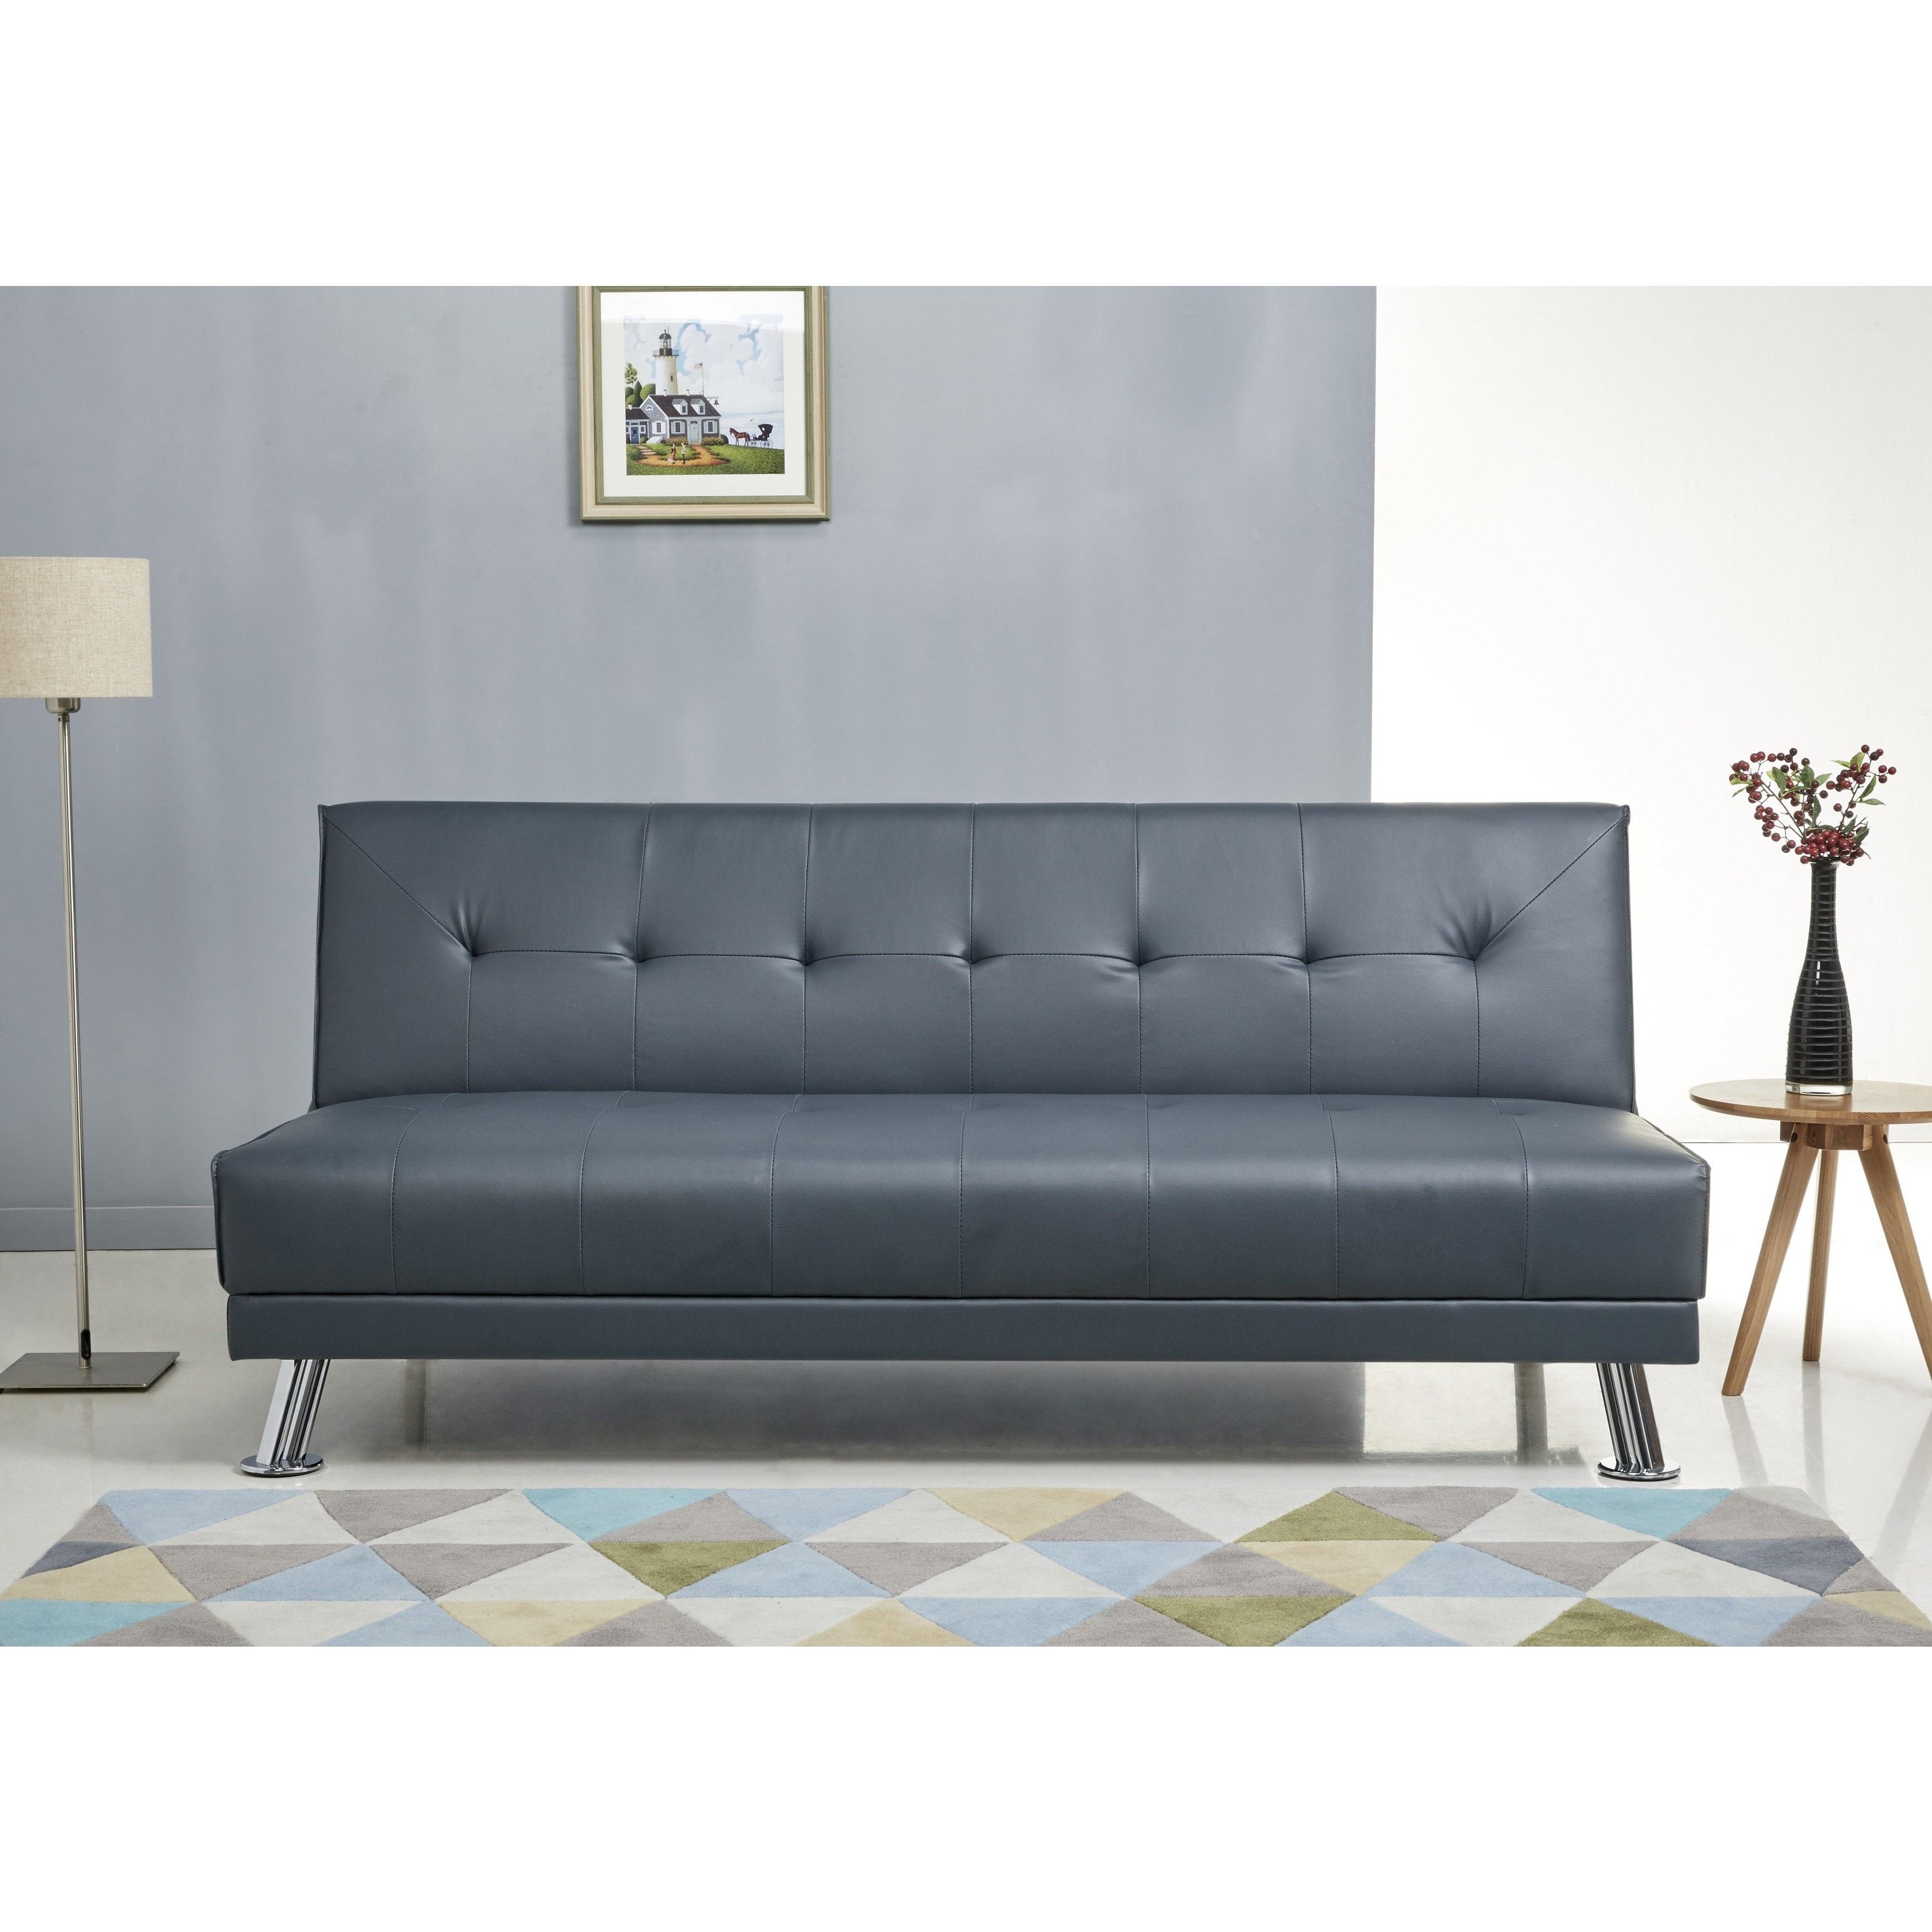 Gentil Carson Carrington Karlskoga Steel Blue Leather Sofa Bed